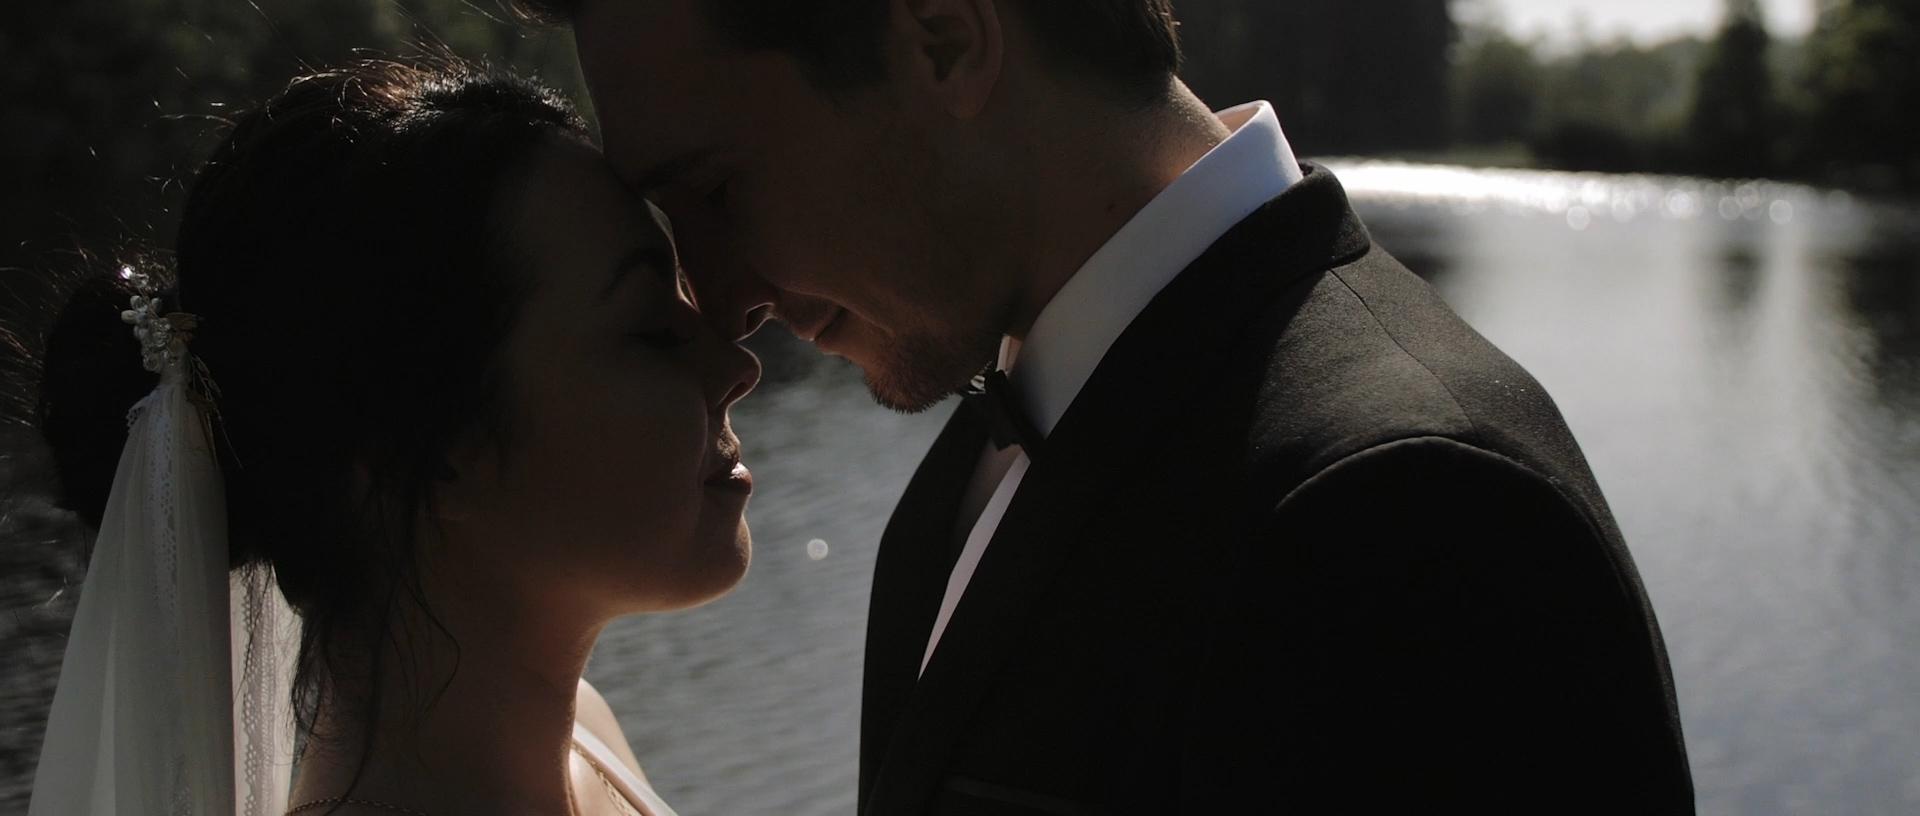 ayr-wedding-videographer_LL_07.jpg